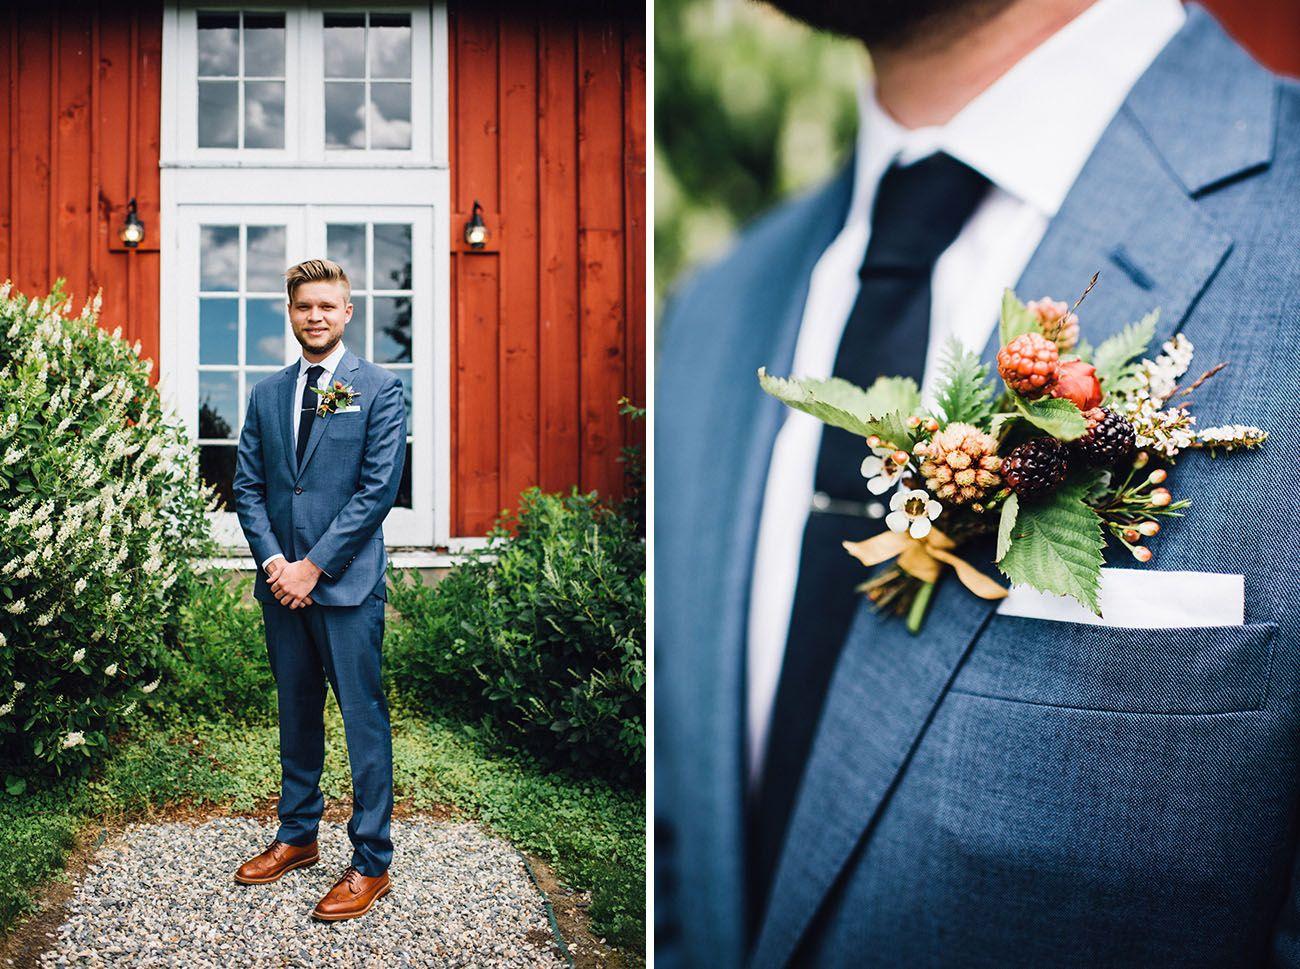 Rustic-Romantic Vermont Farm Wedding: Rawan + Adrian | Navy groom ...